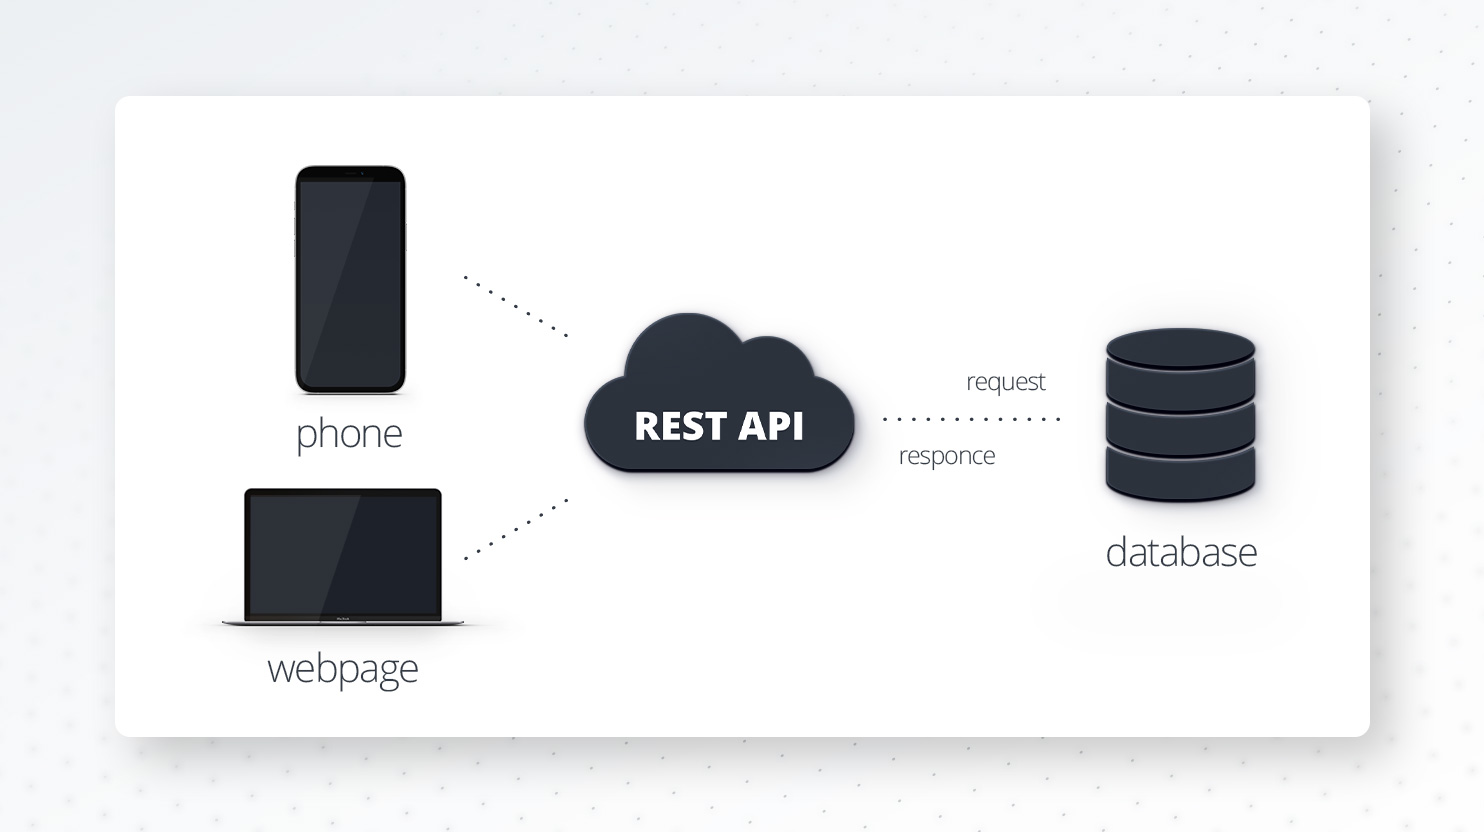 REST API scheme